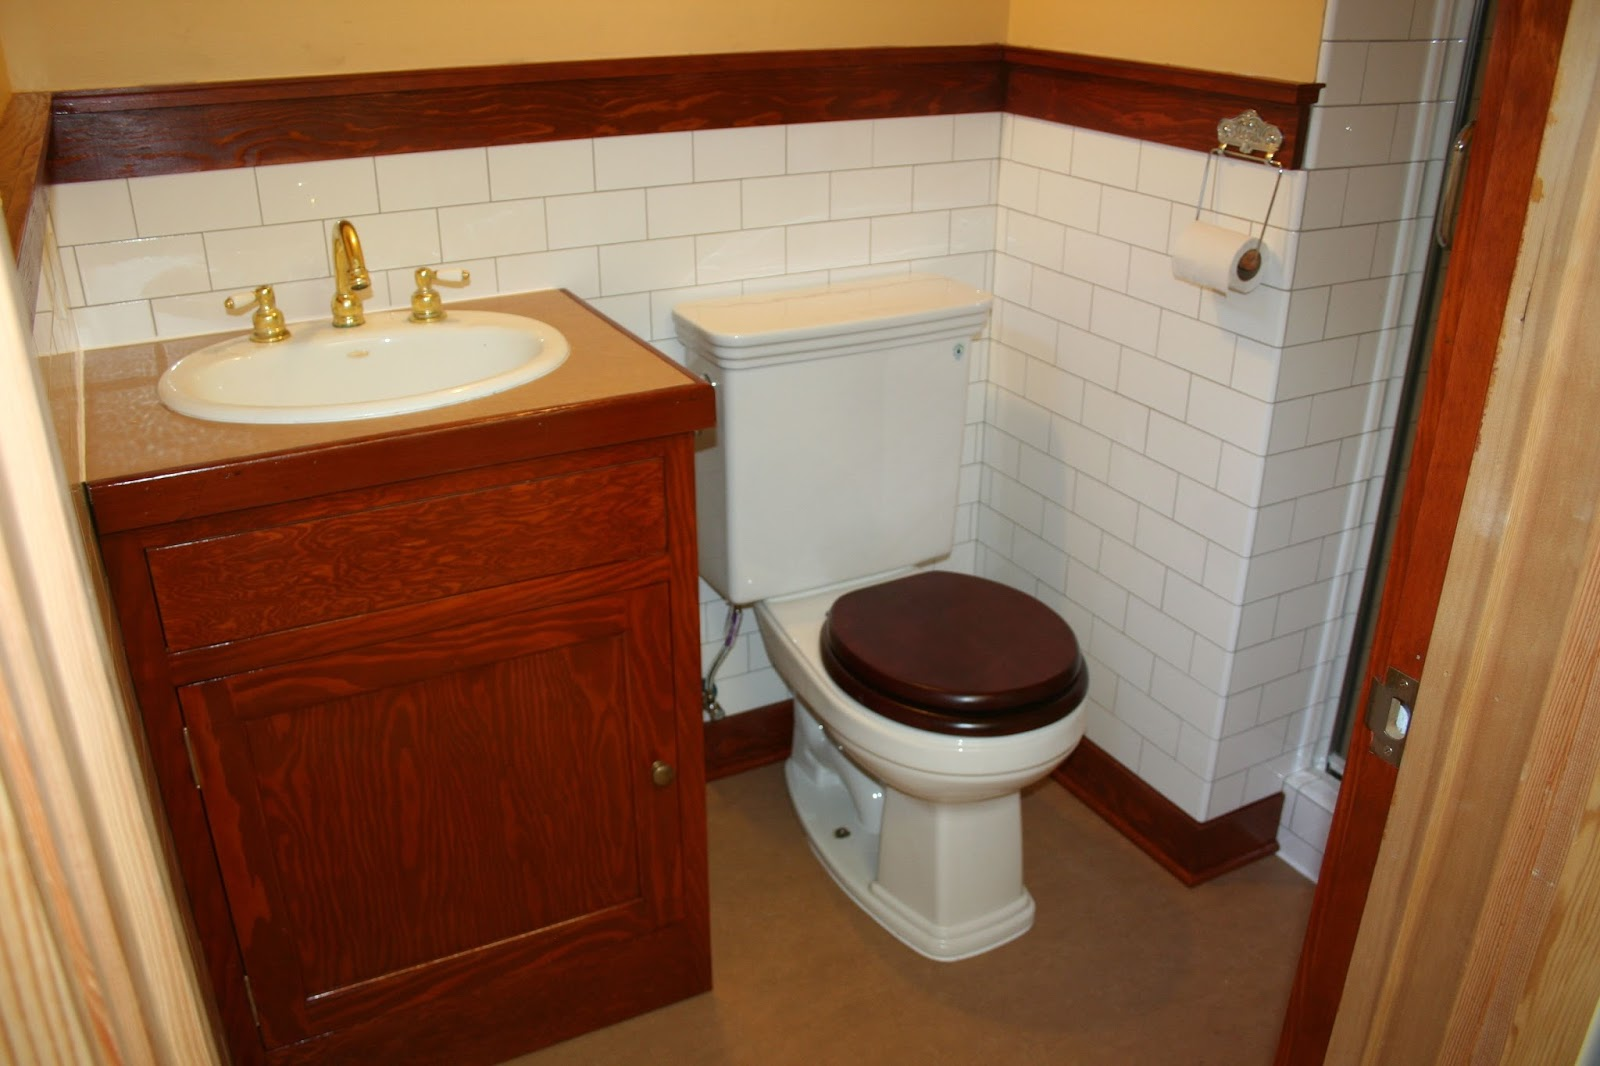 Laurelhurst Craftsman Bungalow: Bathroom Finished For Now